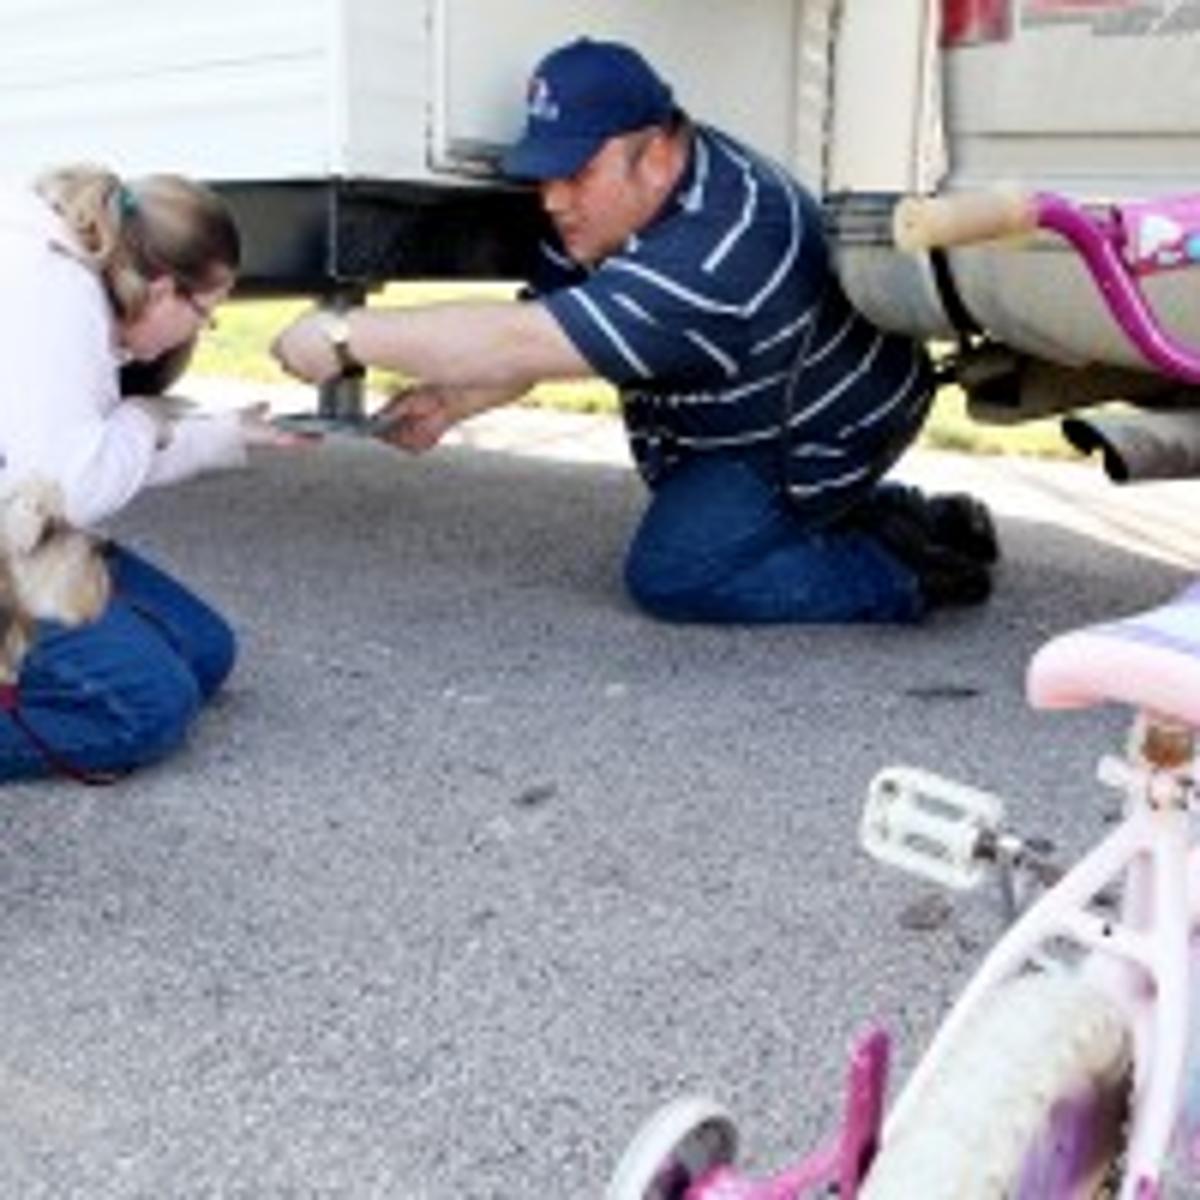 State tweaks rule to discourage long-term camping | News